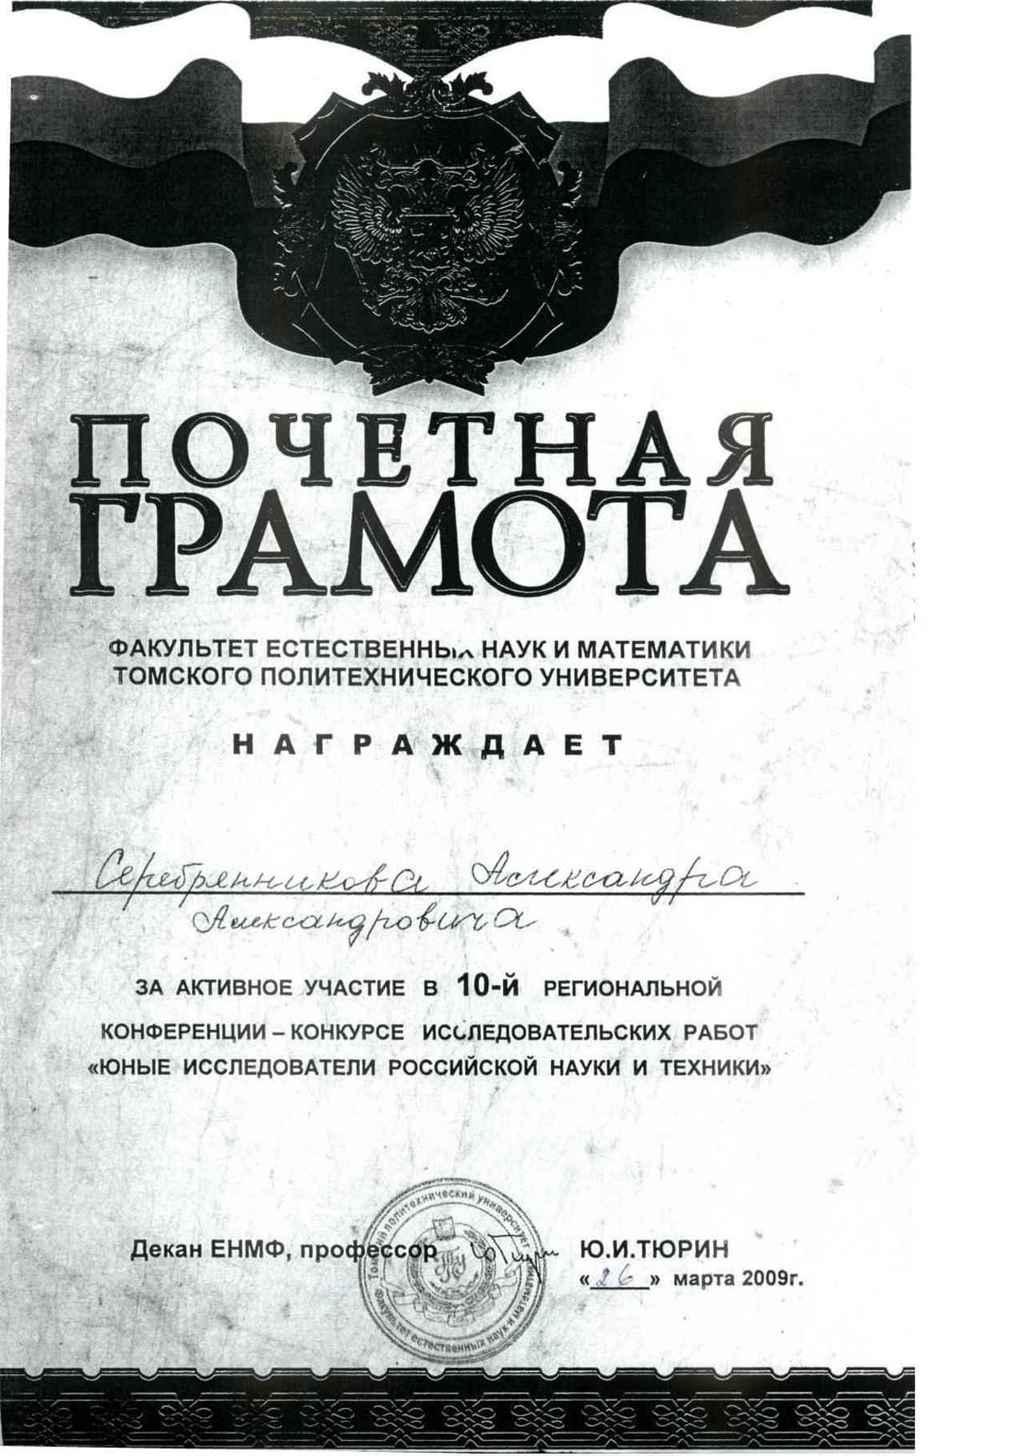 Почетная грамота Серебрянникова Александра